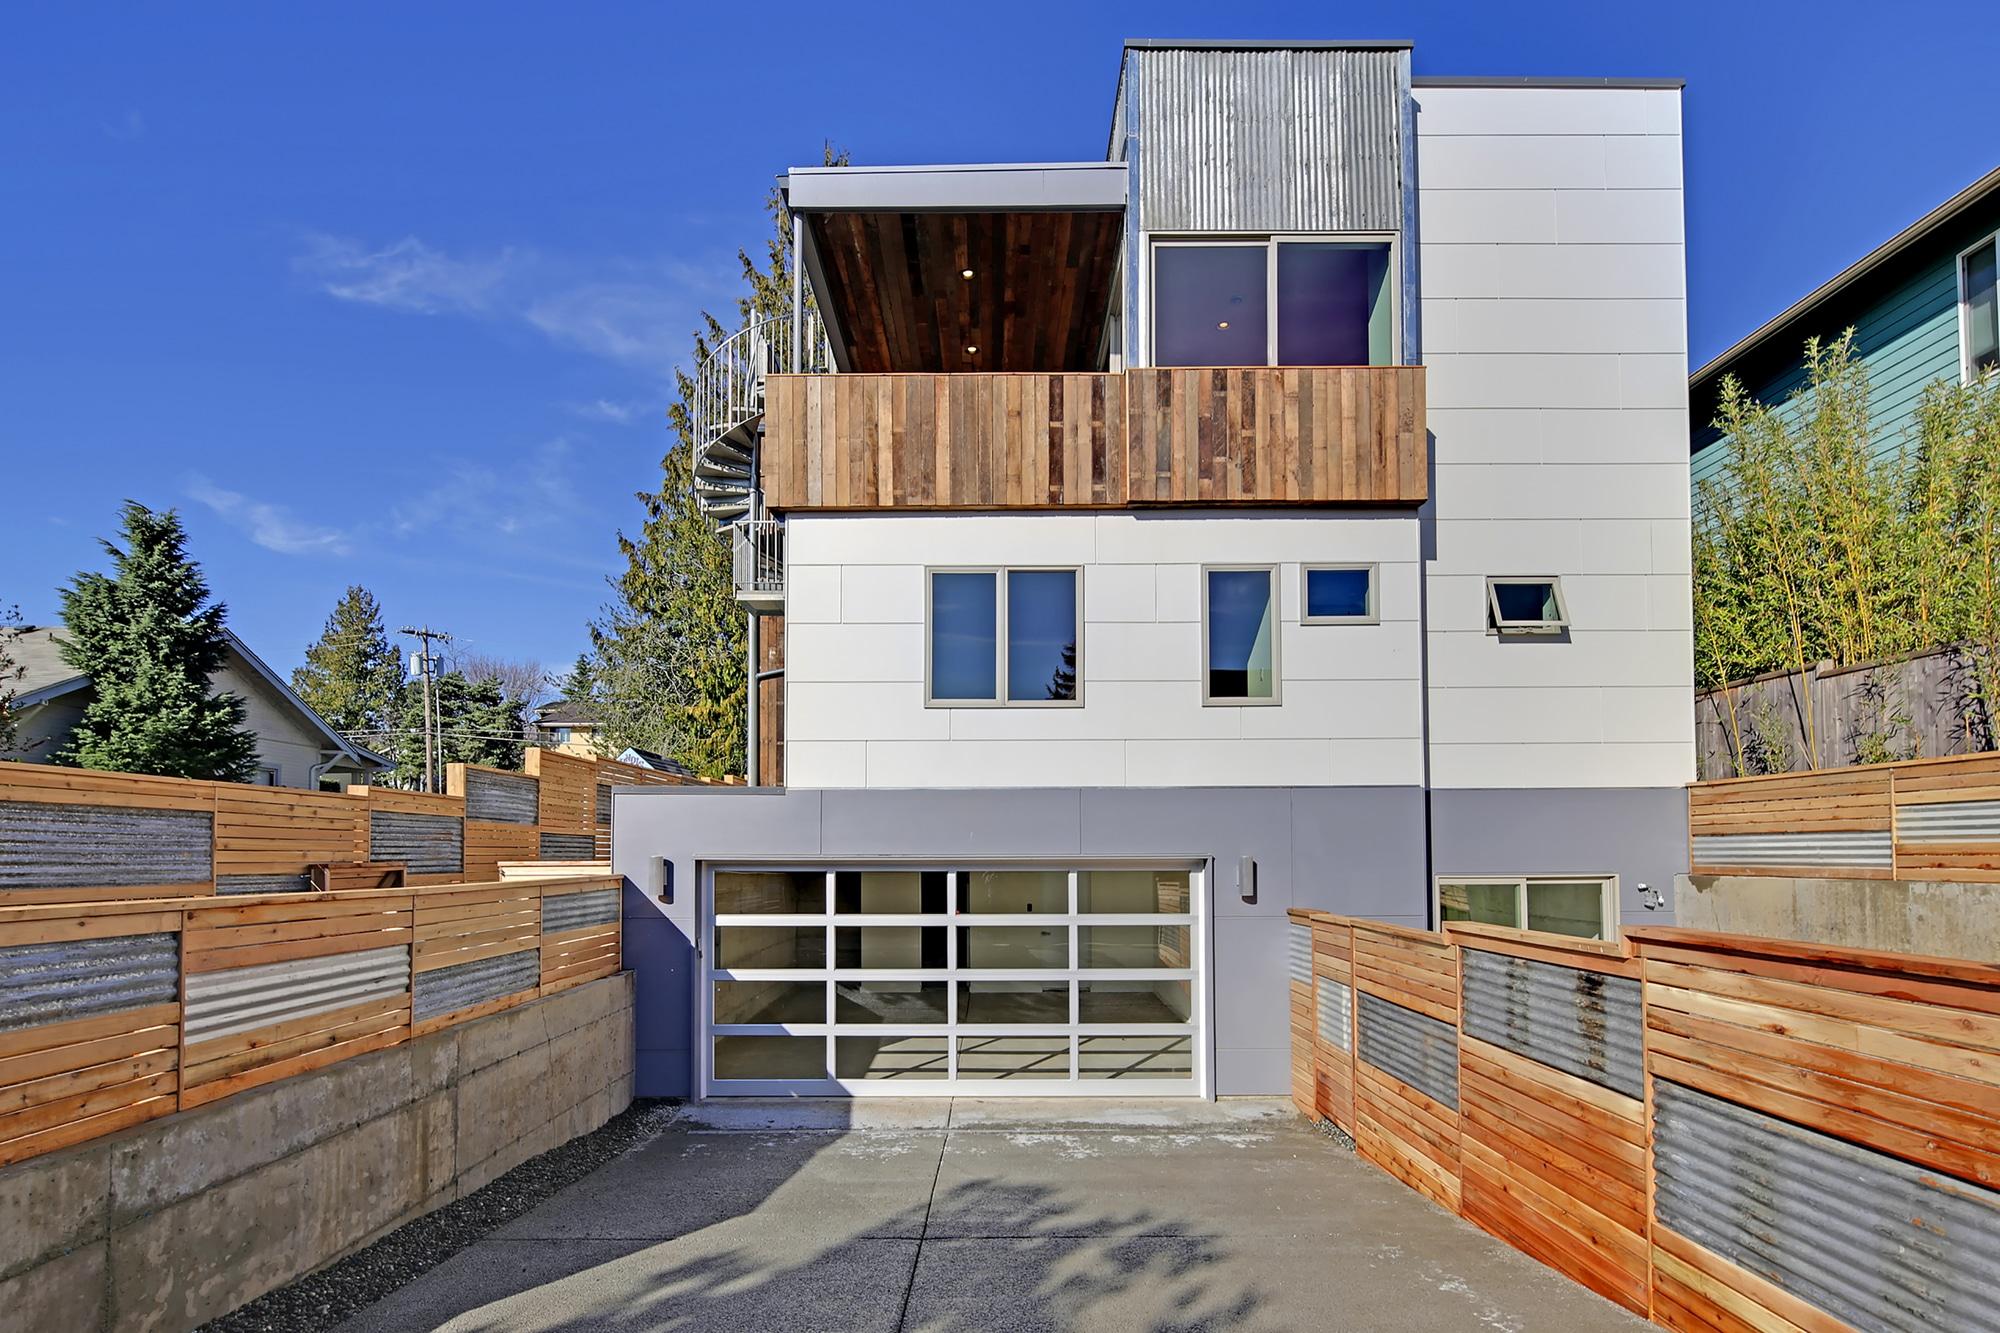 Dise o casa ecol gica autosuficiente planos construye - Materiales de construccion para fachadas ...